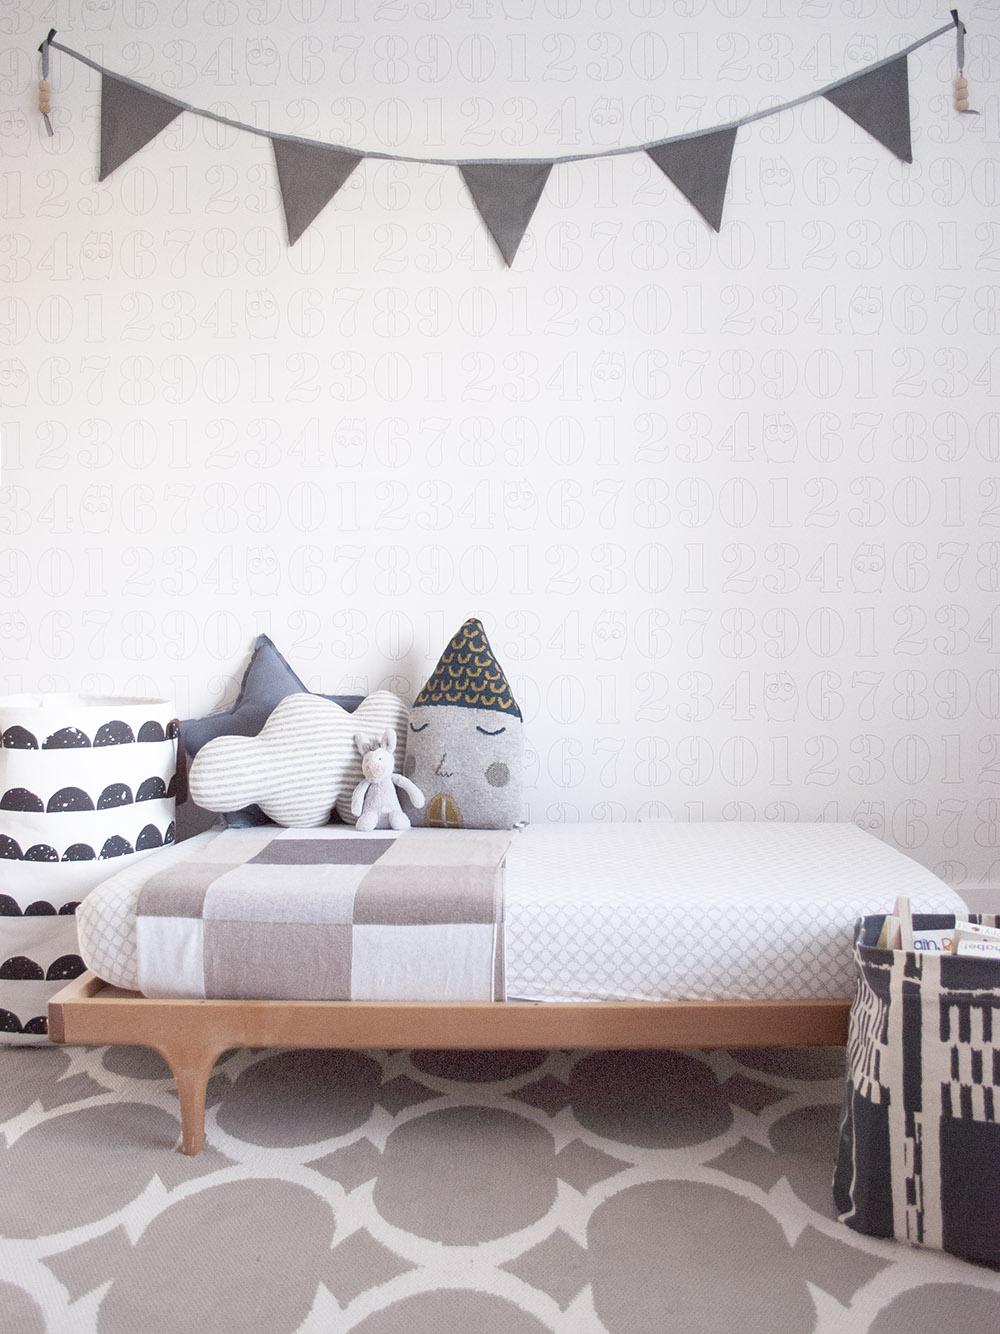 Kalon Studios toddler bed in Vancouver Interior Designer Melissa Barling's son Xavier's room